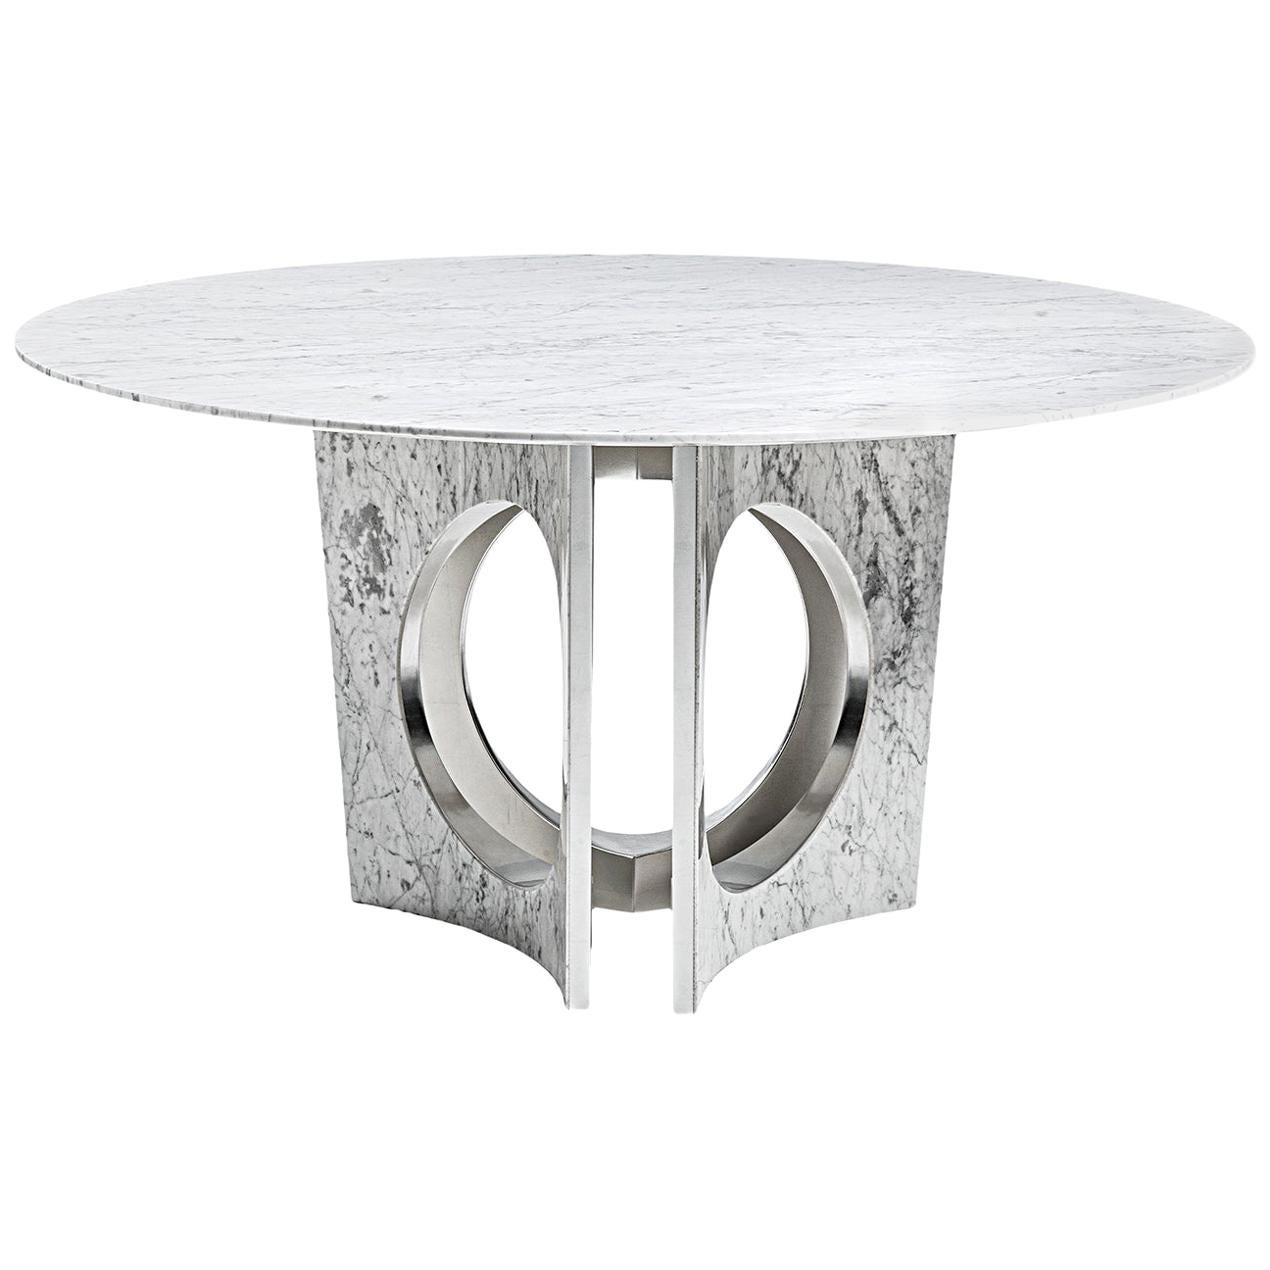 Michelangelo Round Dining Table by Carlo Bimbi